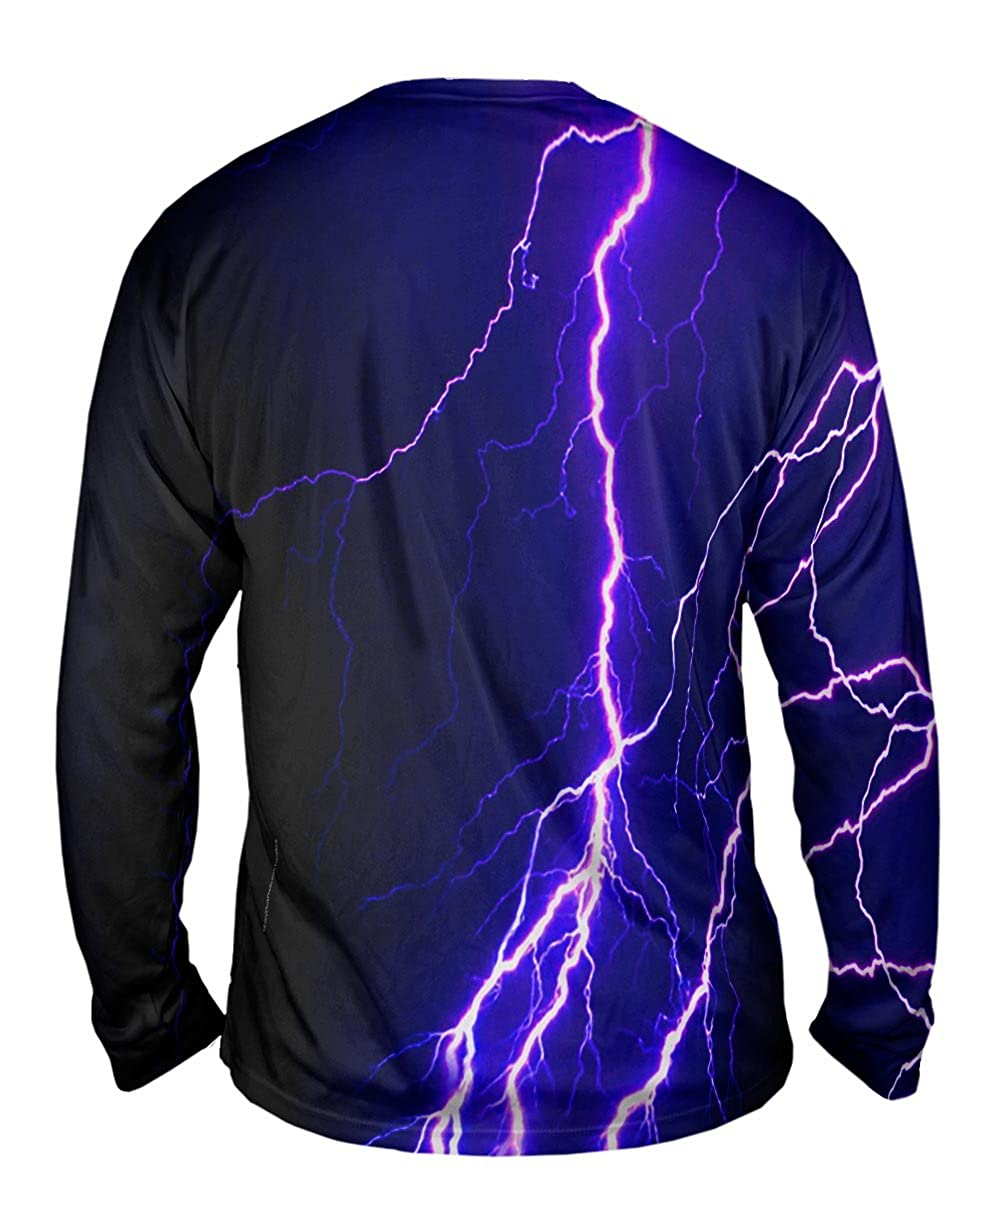 TShirt Violet Lightning Storm Mens Long Sleeve Yizzam